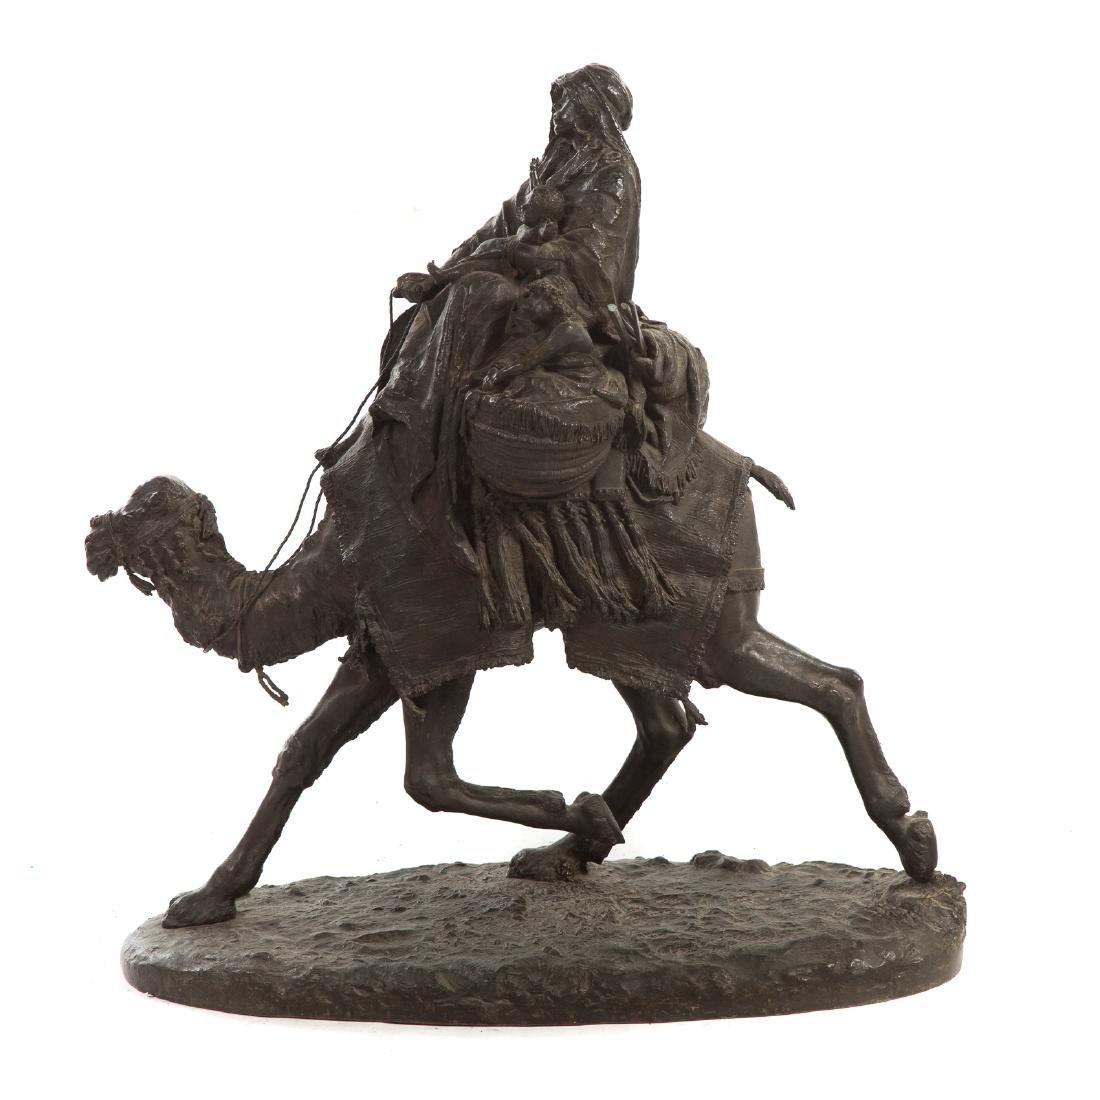 Ernesto Biondi. Woman and Children, Bronze